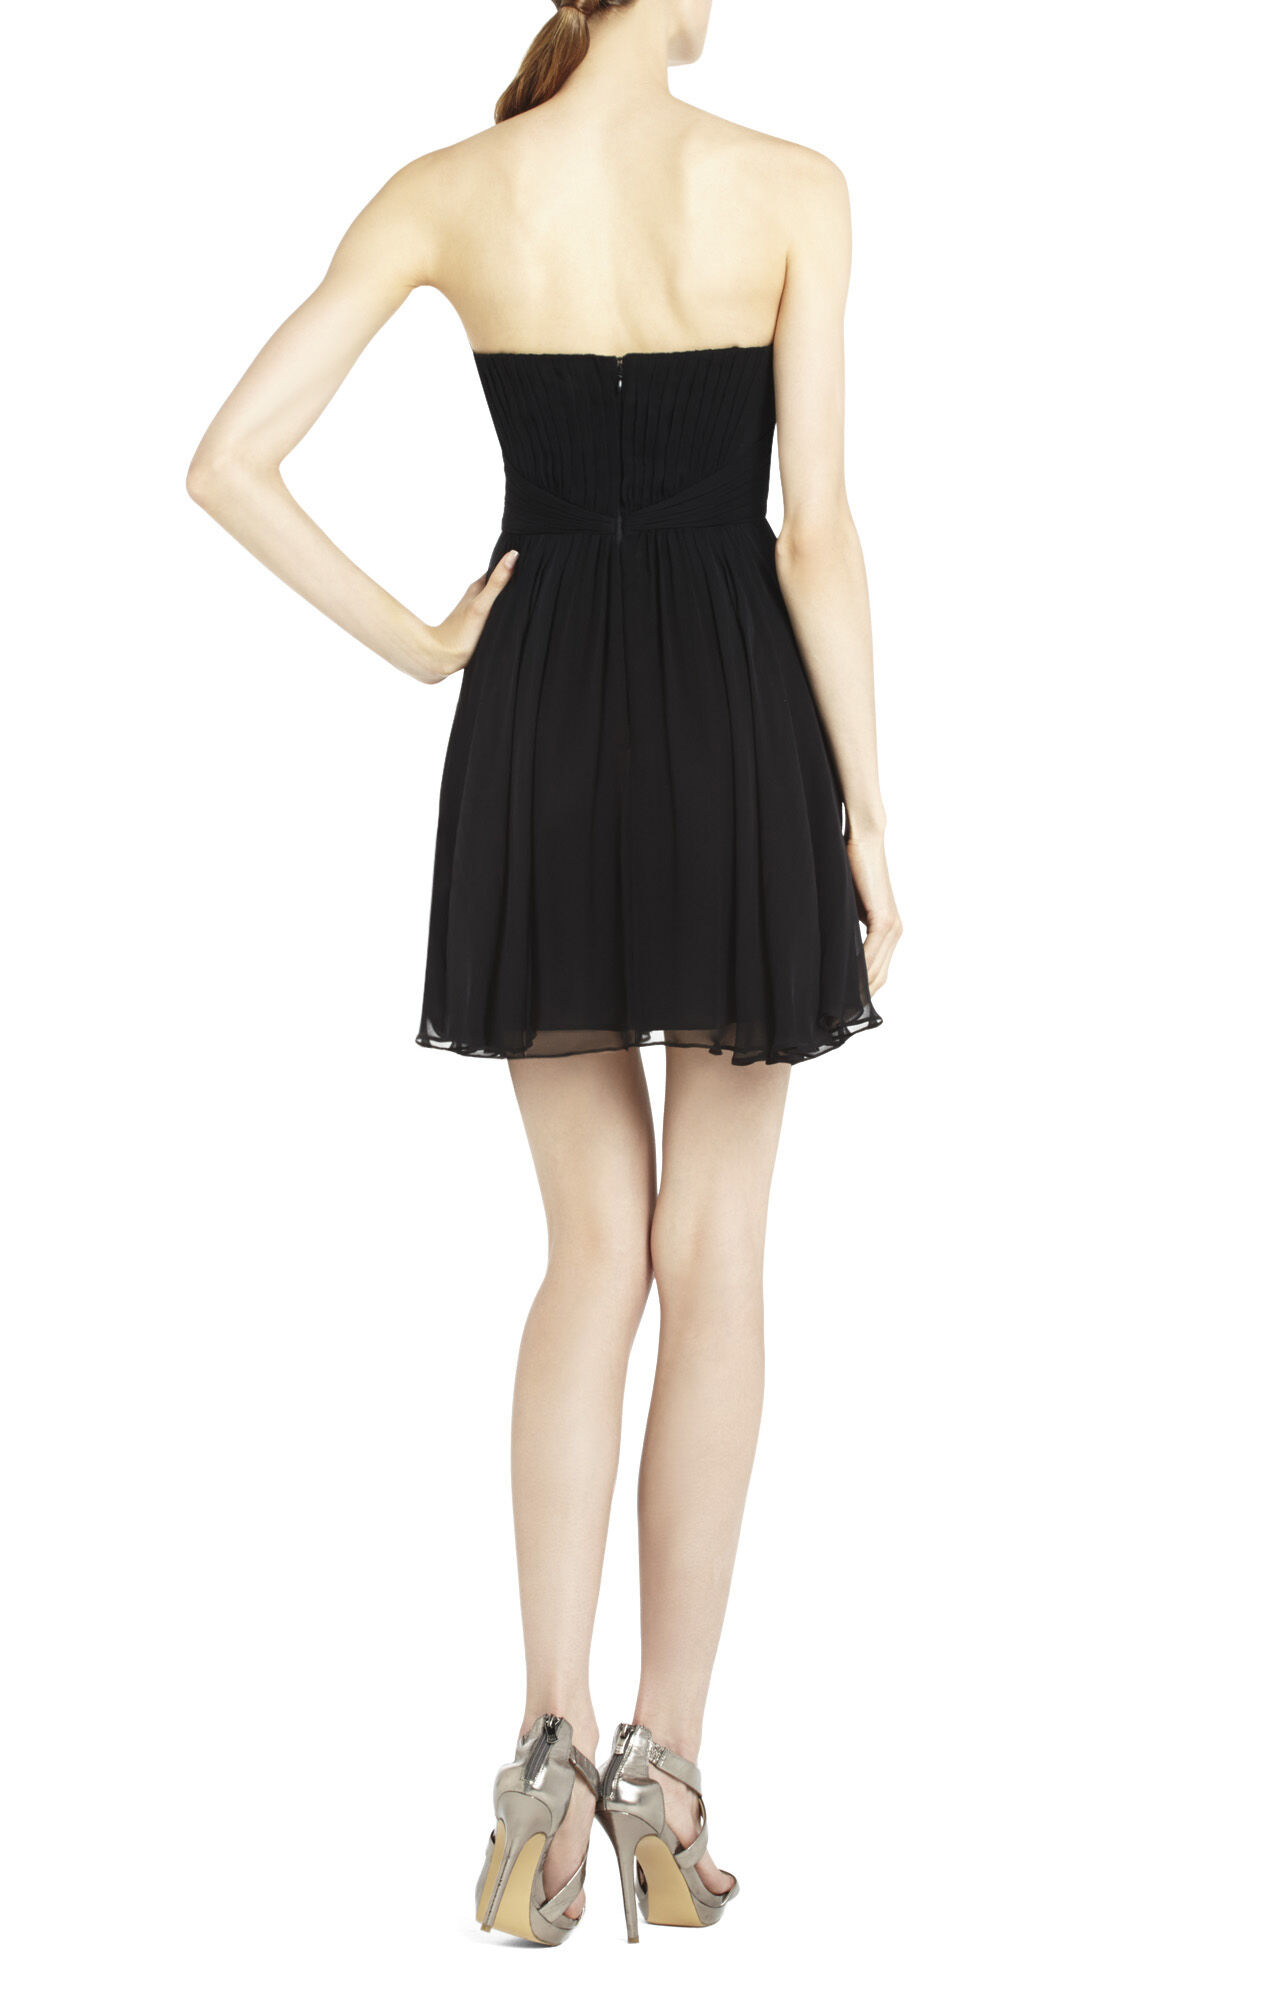 Duran Strapless Dress With Skirt Drape